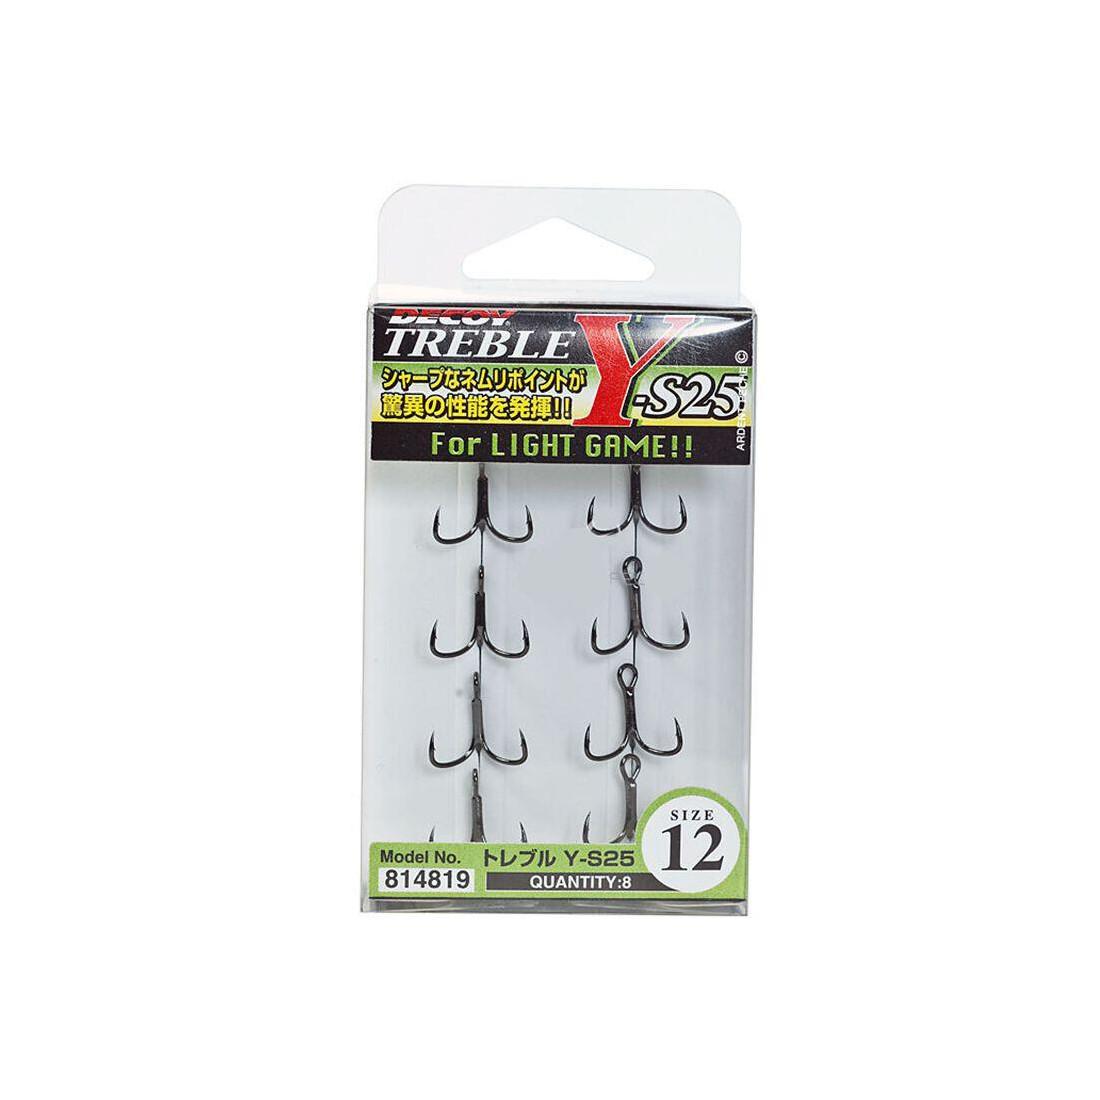 Decoy Y-s25 Treble Hook Light Game Treble Hooks Size 12-4819 for sale online